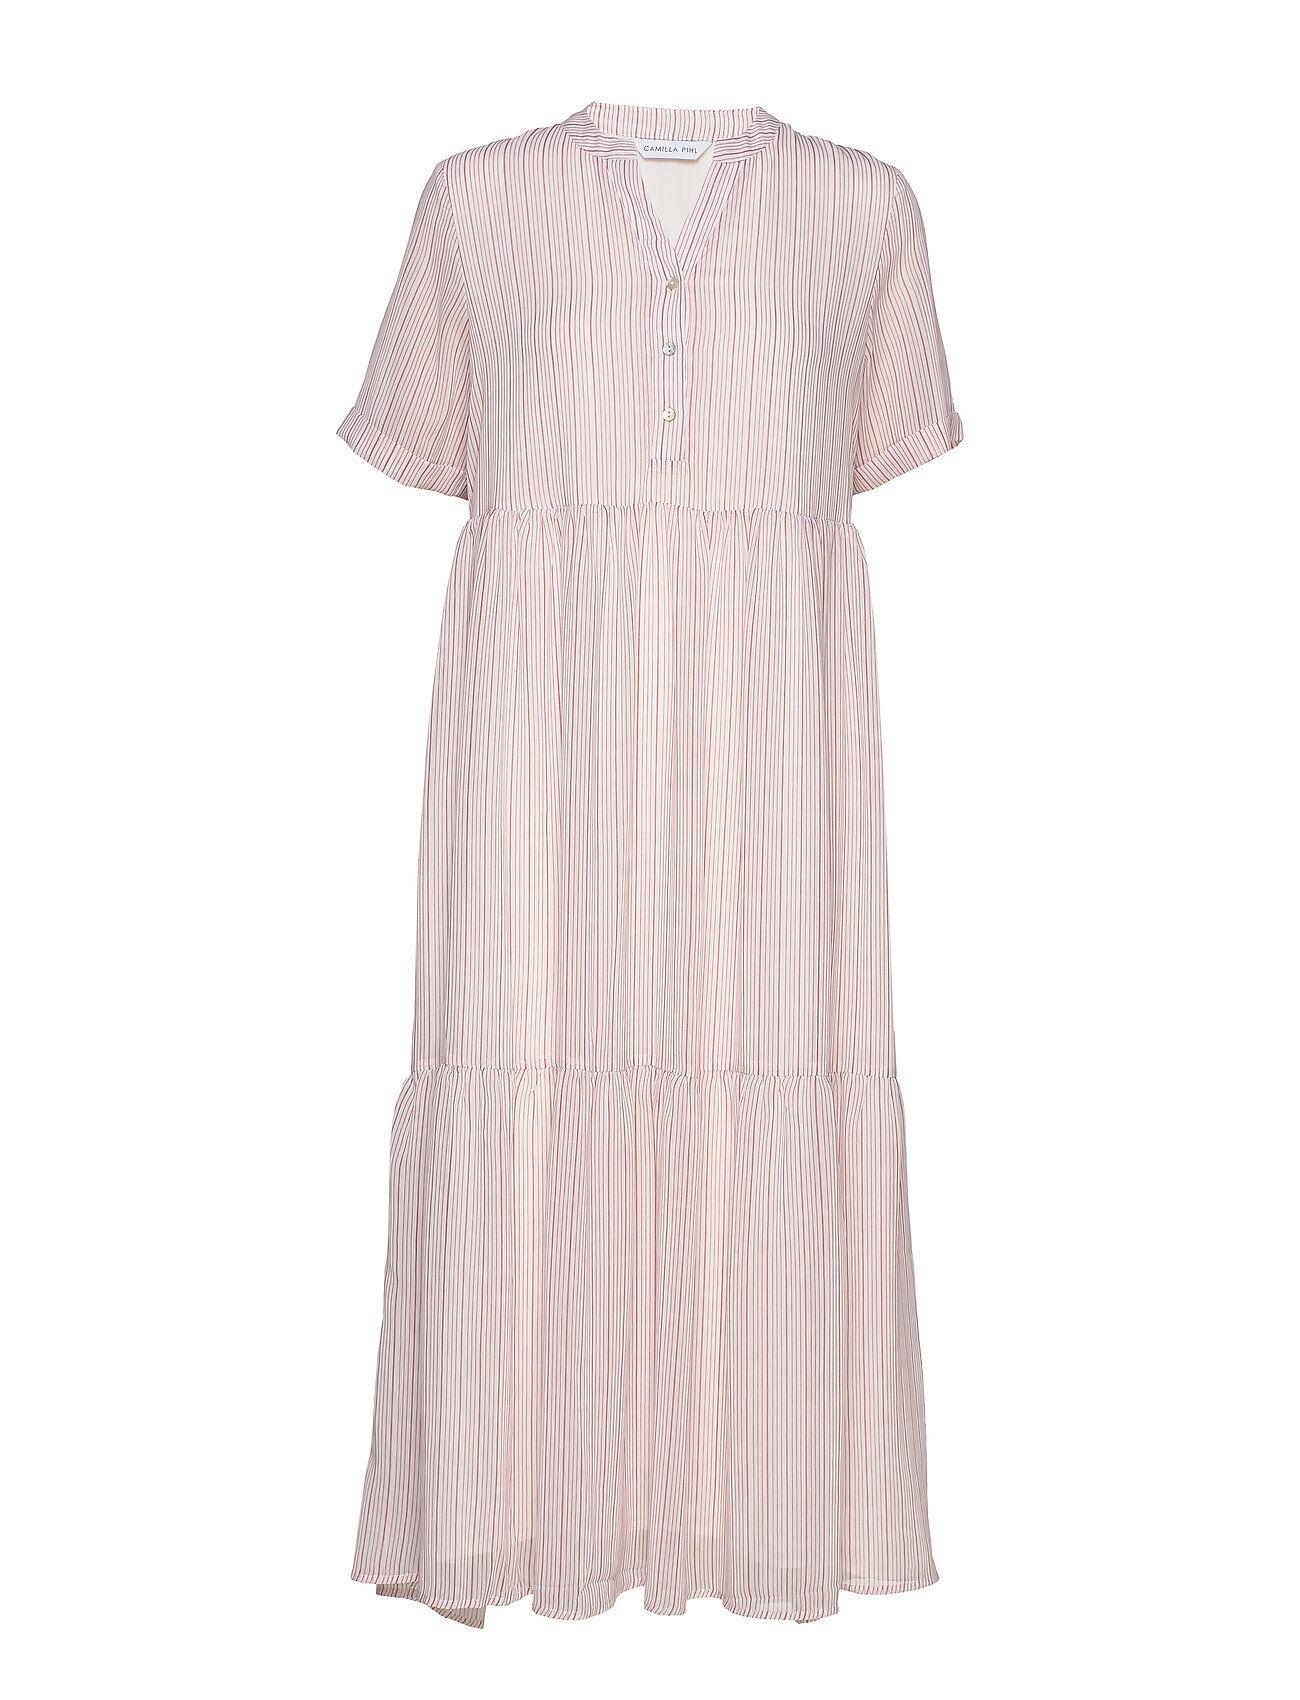 Camilla Pihl Flow Dress Maksimekko Juhlamekko Vaaleanpunainen Camilla Pihl